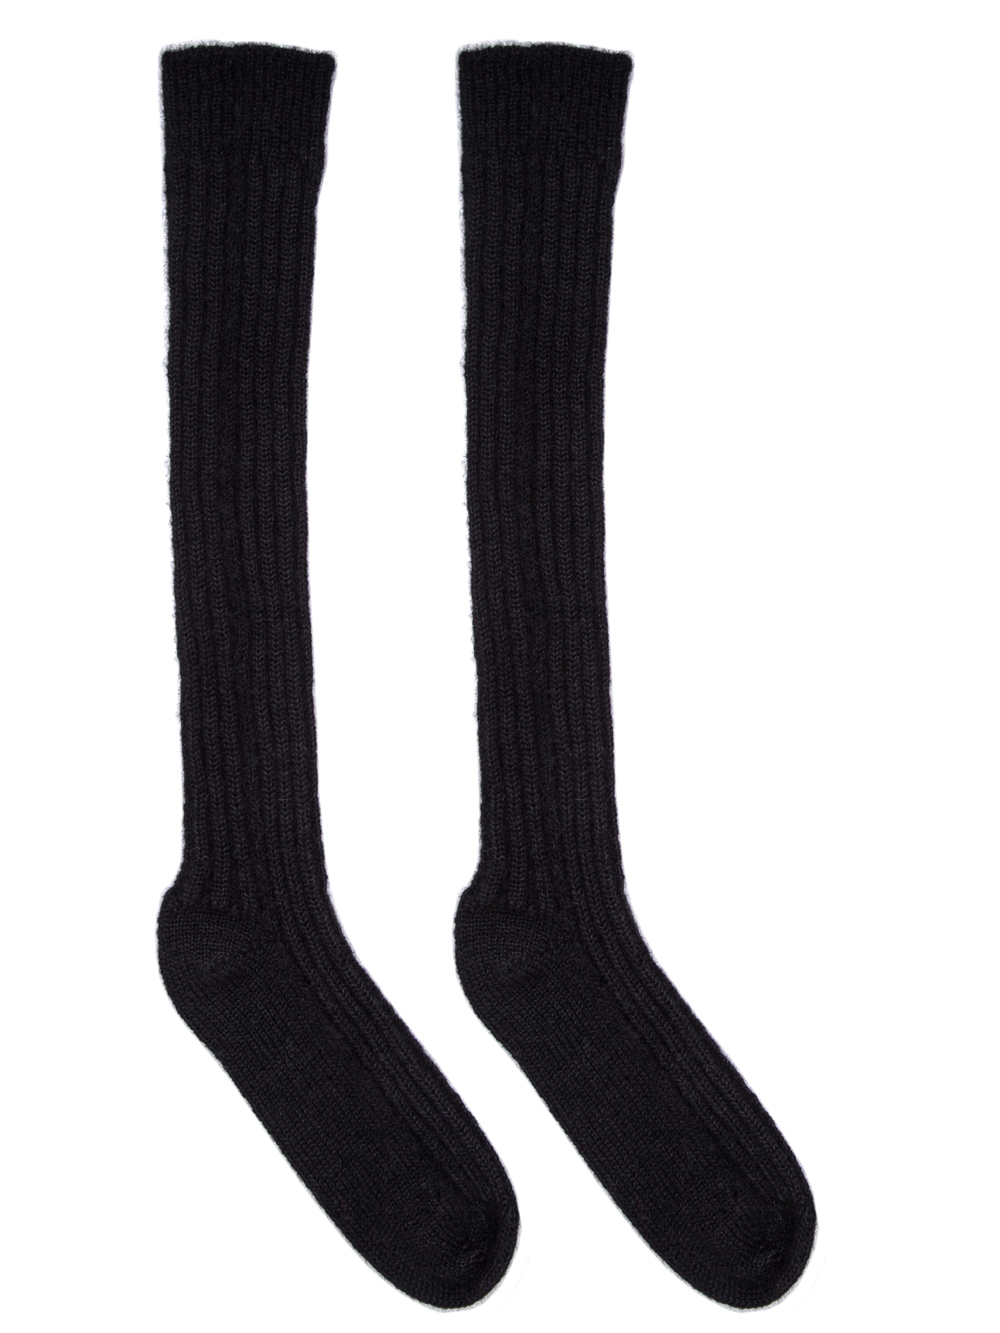 RICK OWENS FW18 SISYPHUS OFF-THE-RUNWAY RIBBED SOCKS IN BLACK.